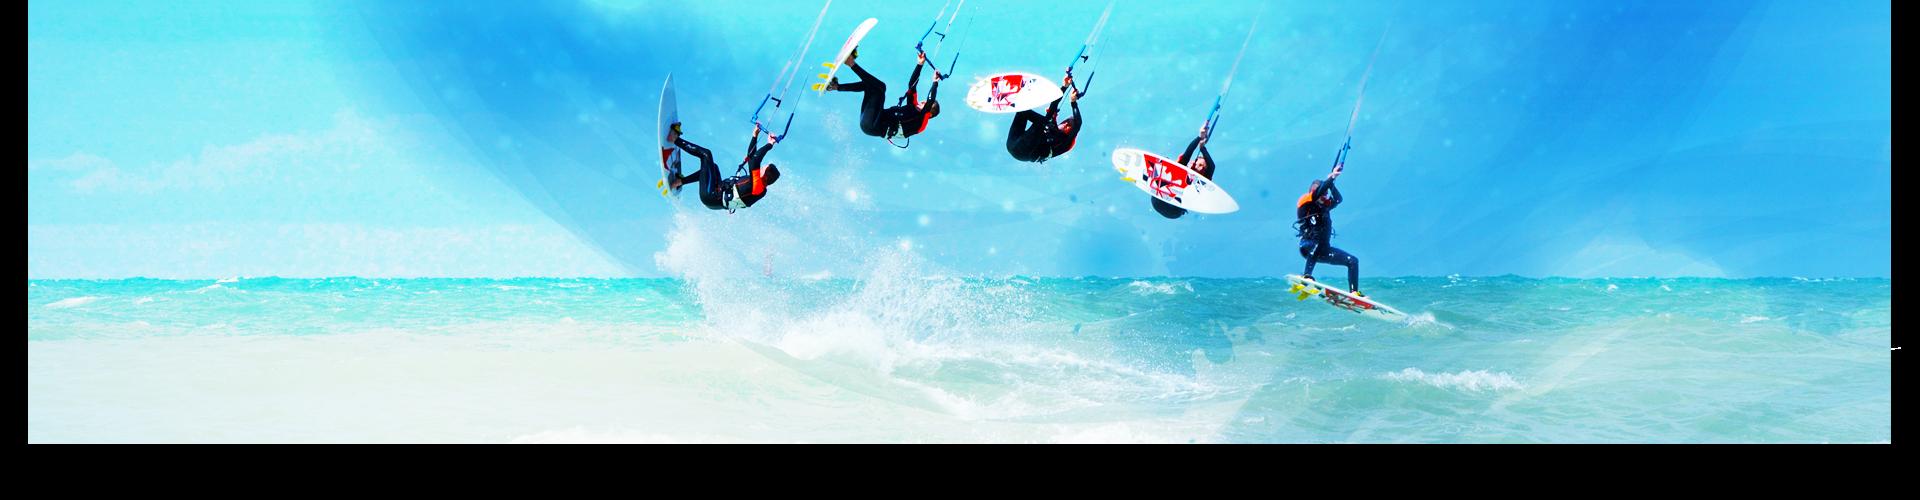 kitesurfing in slowmotion